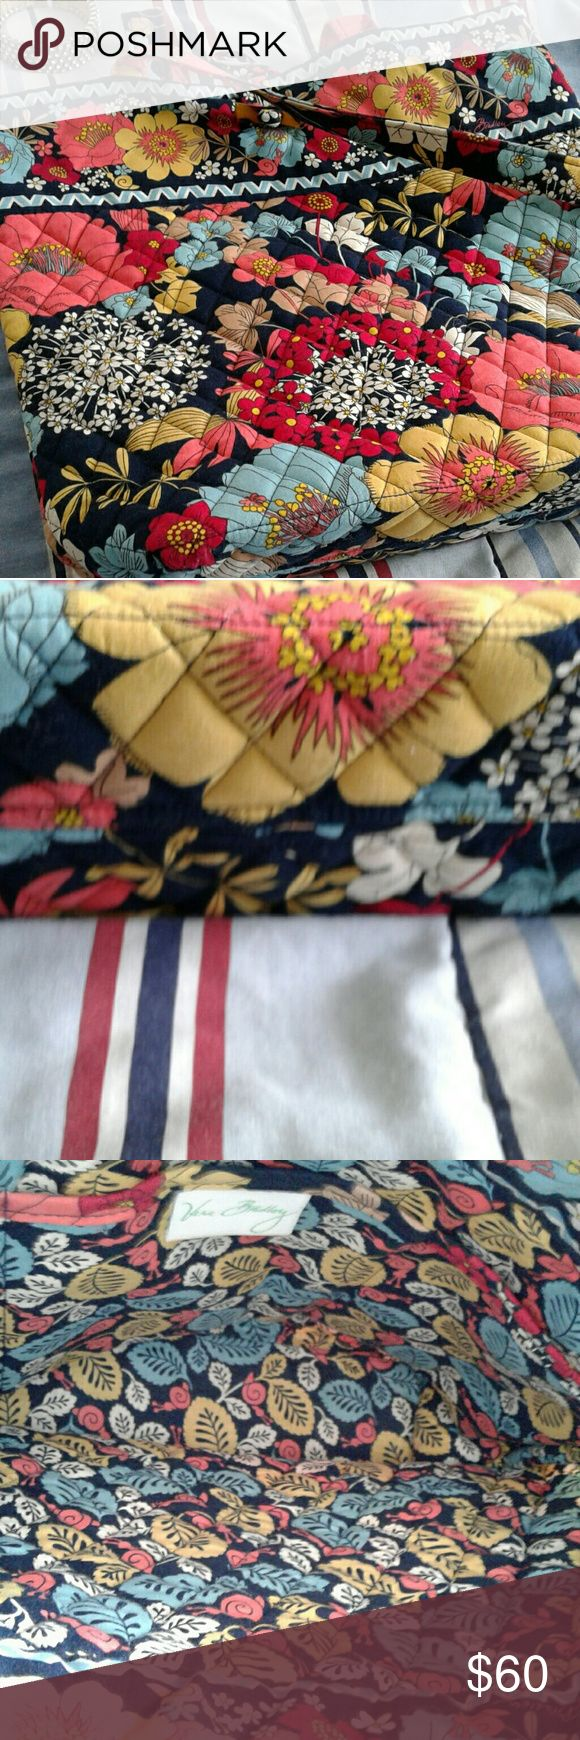 Vera Bradley tote bag A very pretty Vera Bradley bag in excellent condition. Vera Bradley Bags Totes